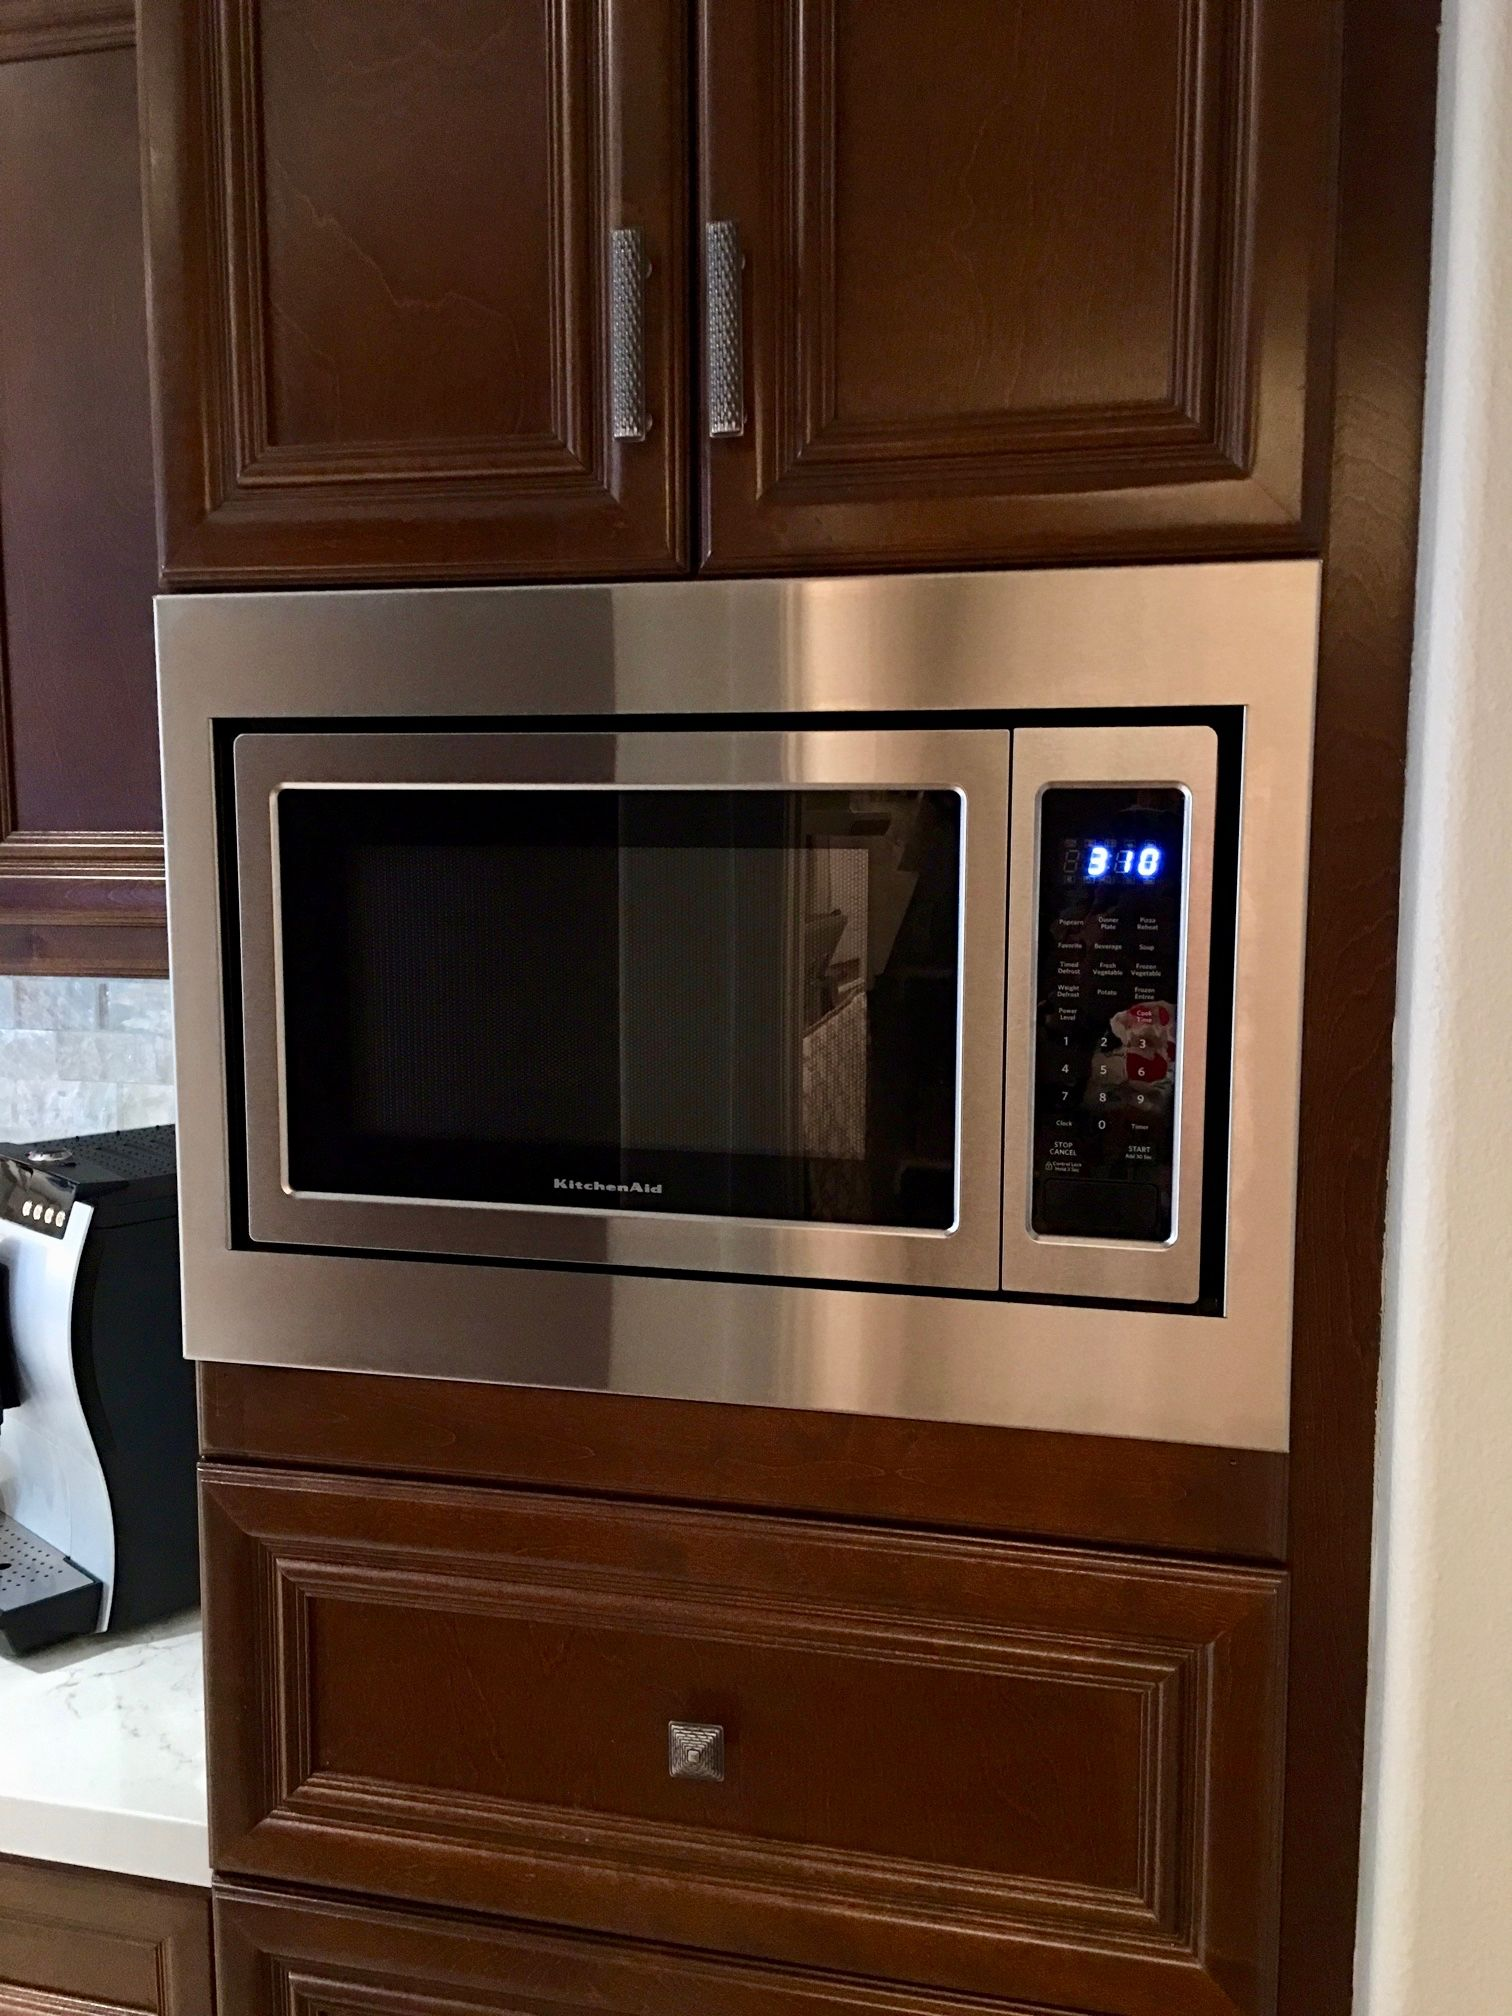 kitchen aid microwaves pantry cabinet ikea custom trim kit for a kitchenaid microwave model